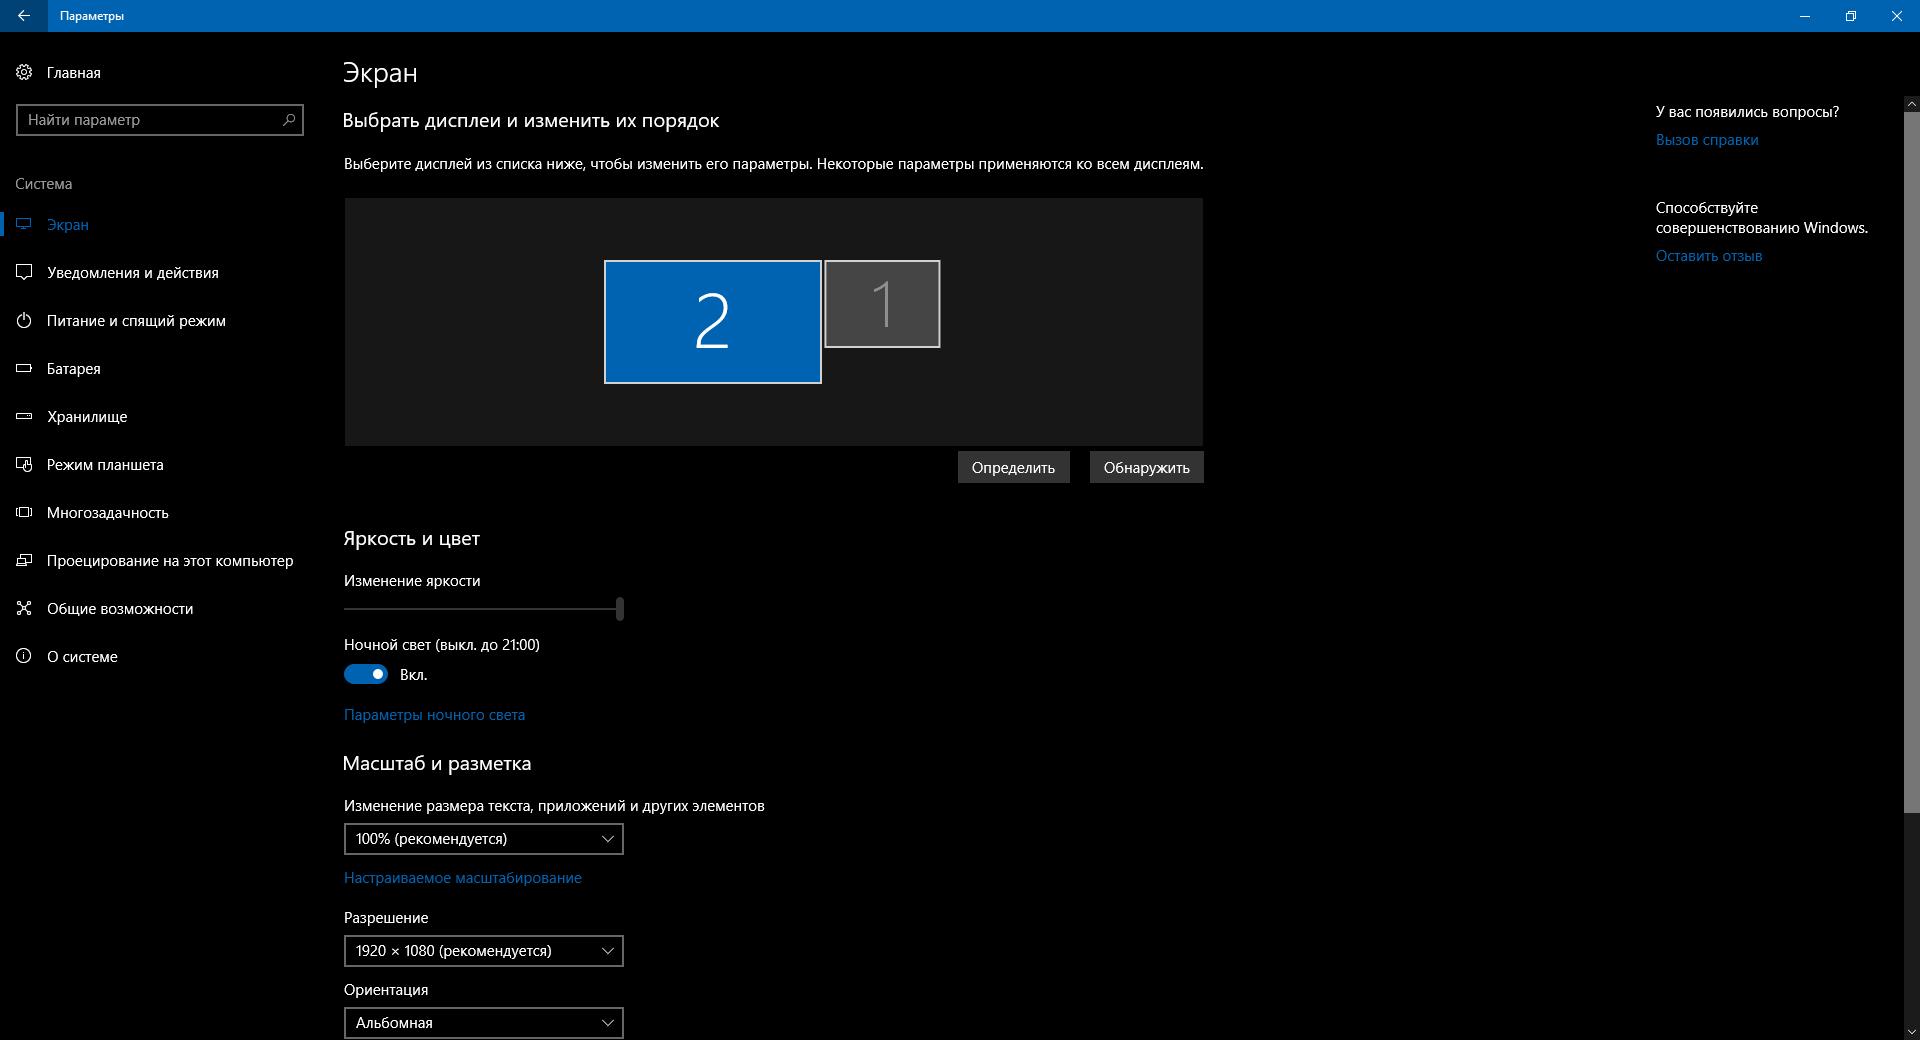 Возможности Windows 10 2